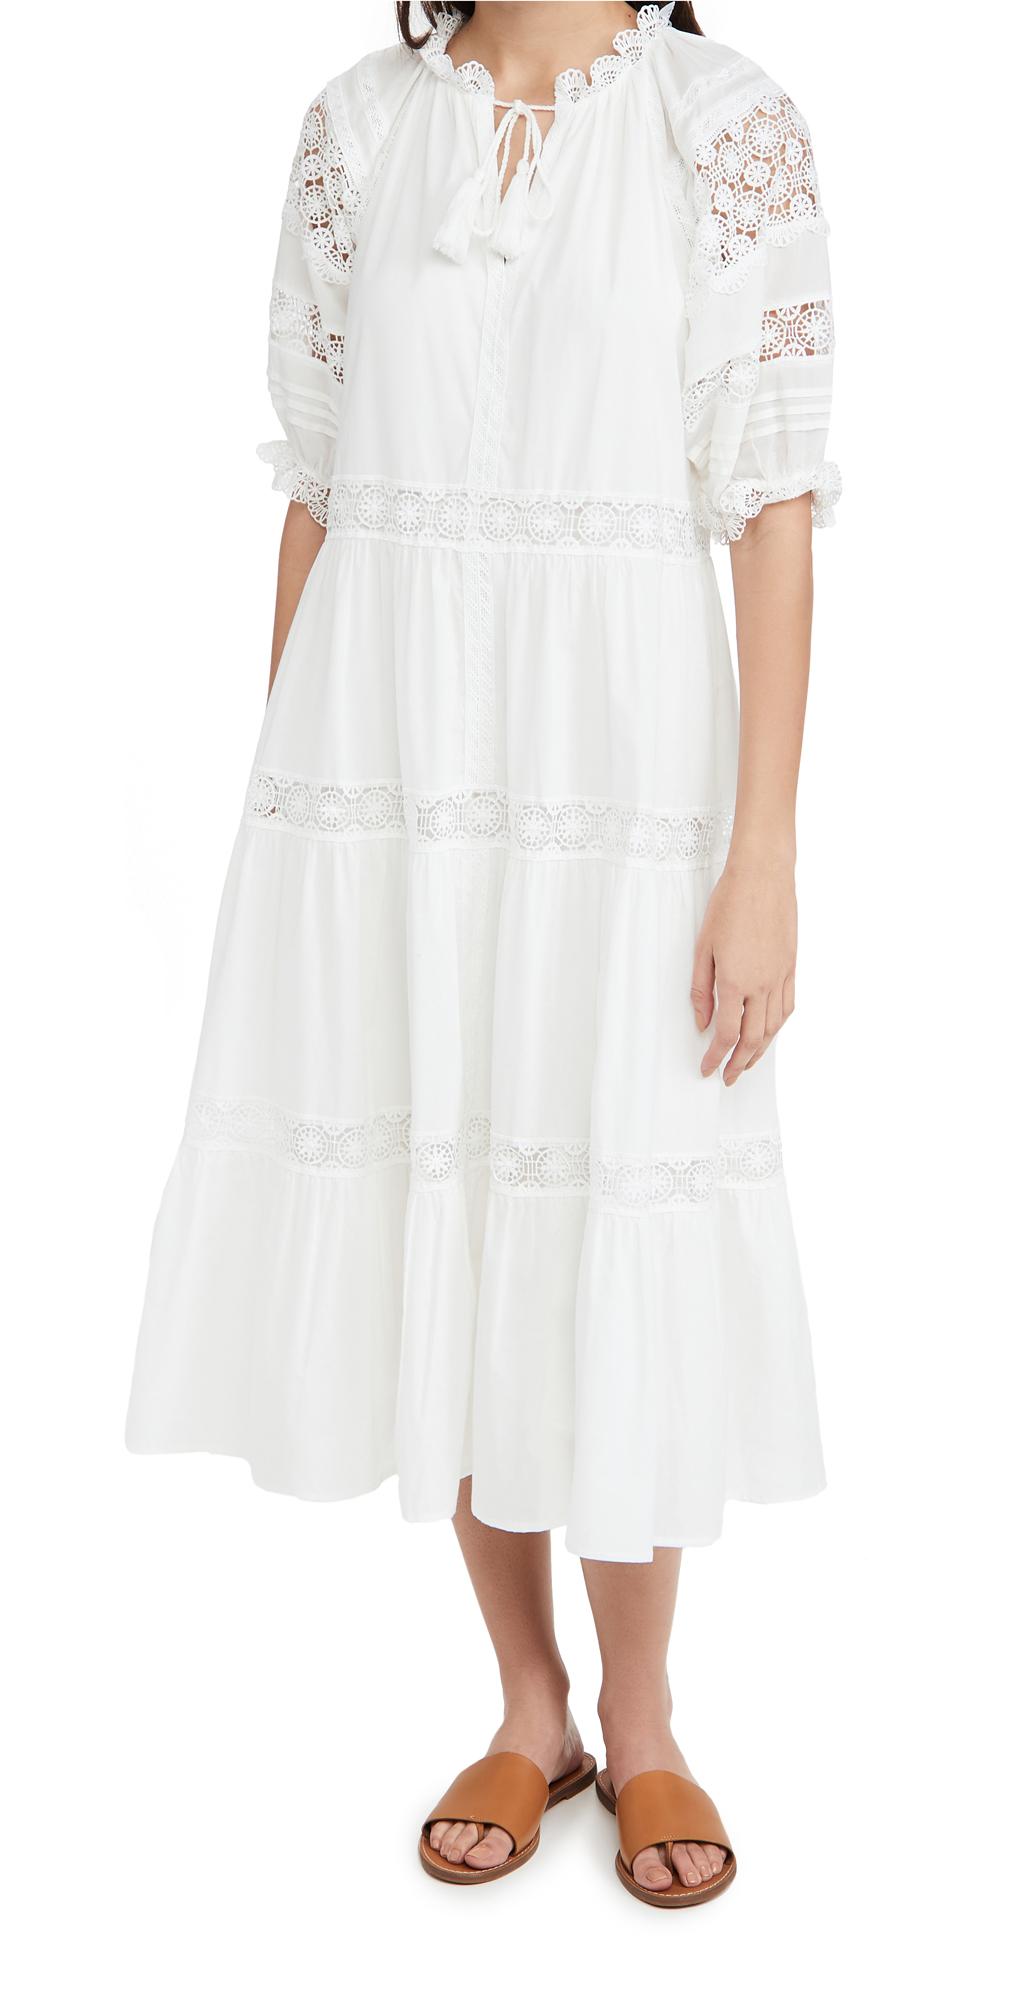 En Saison Tiered Lace Detail Midi Dress